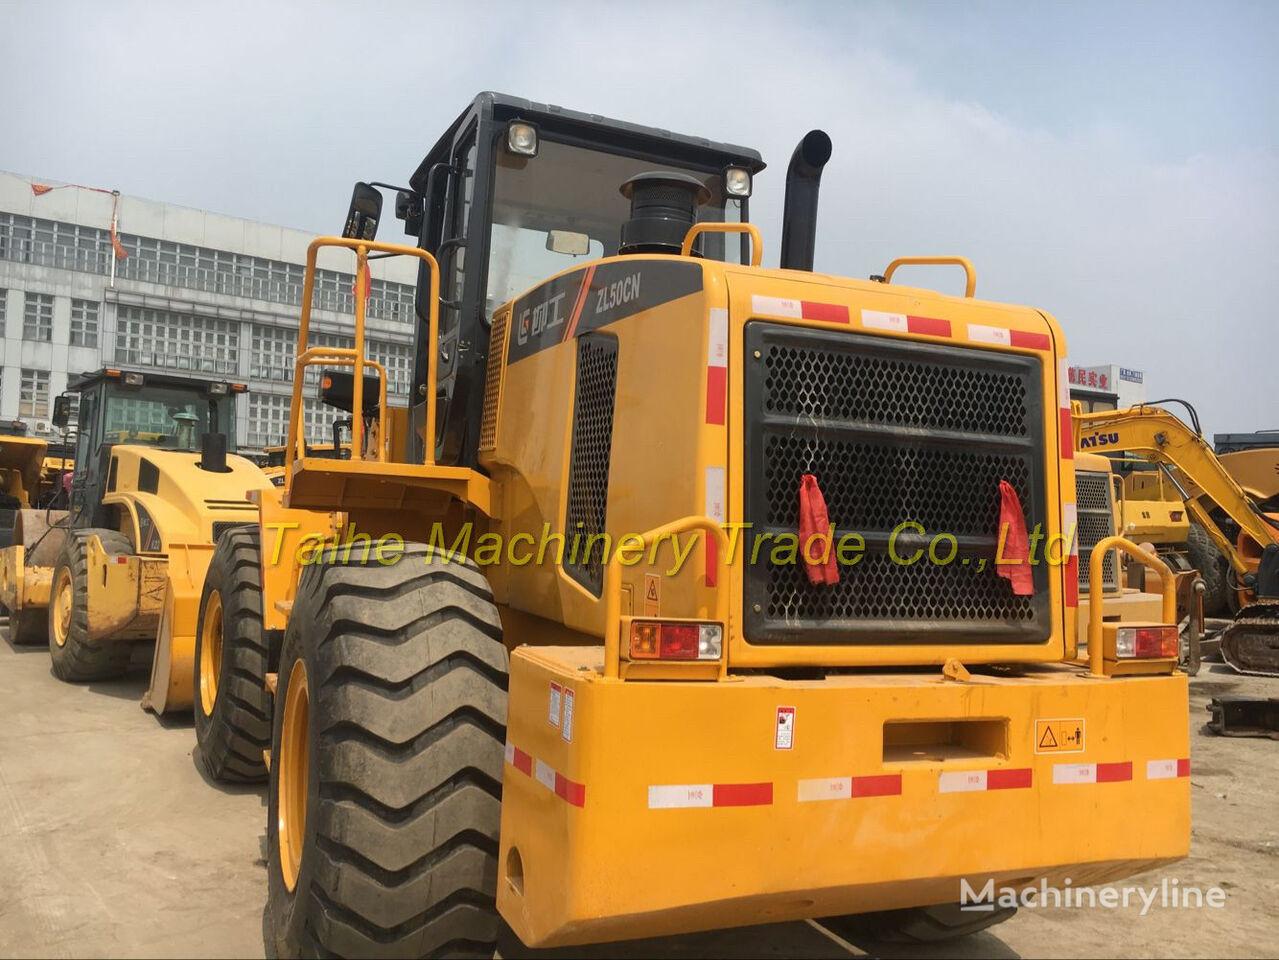 LIUGONG ZL50CN wheel loader